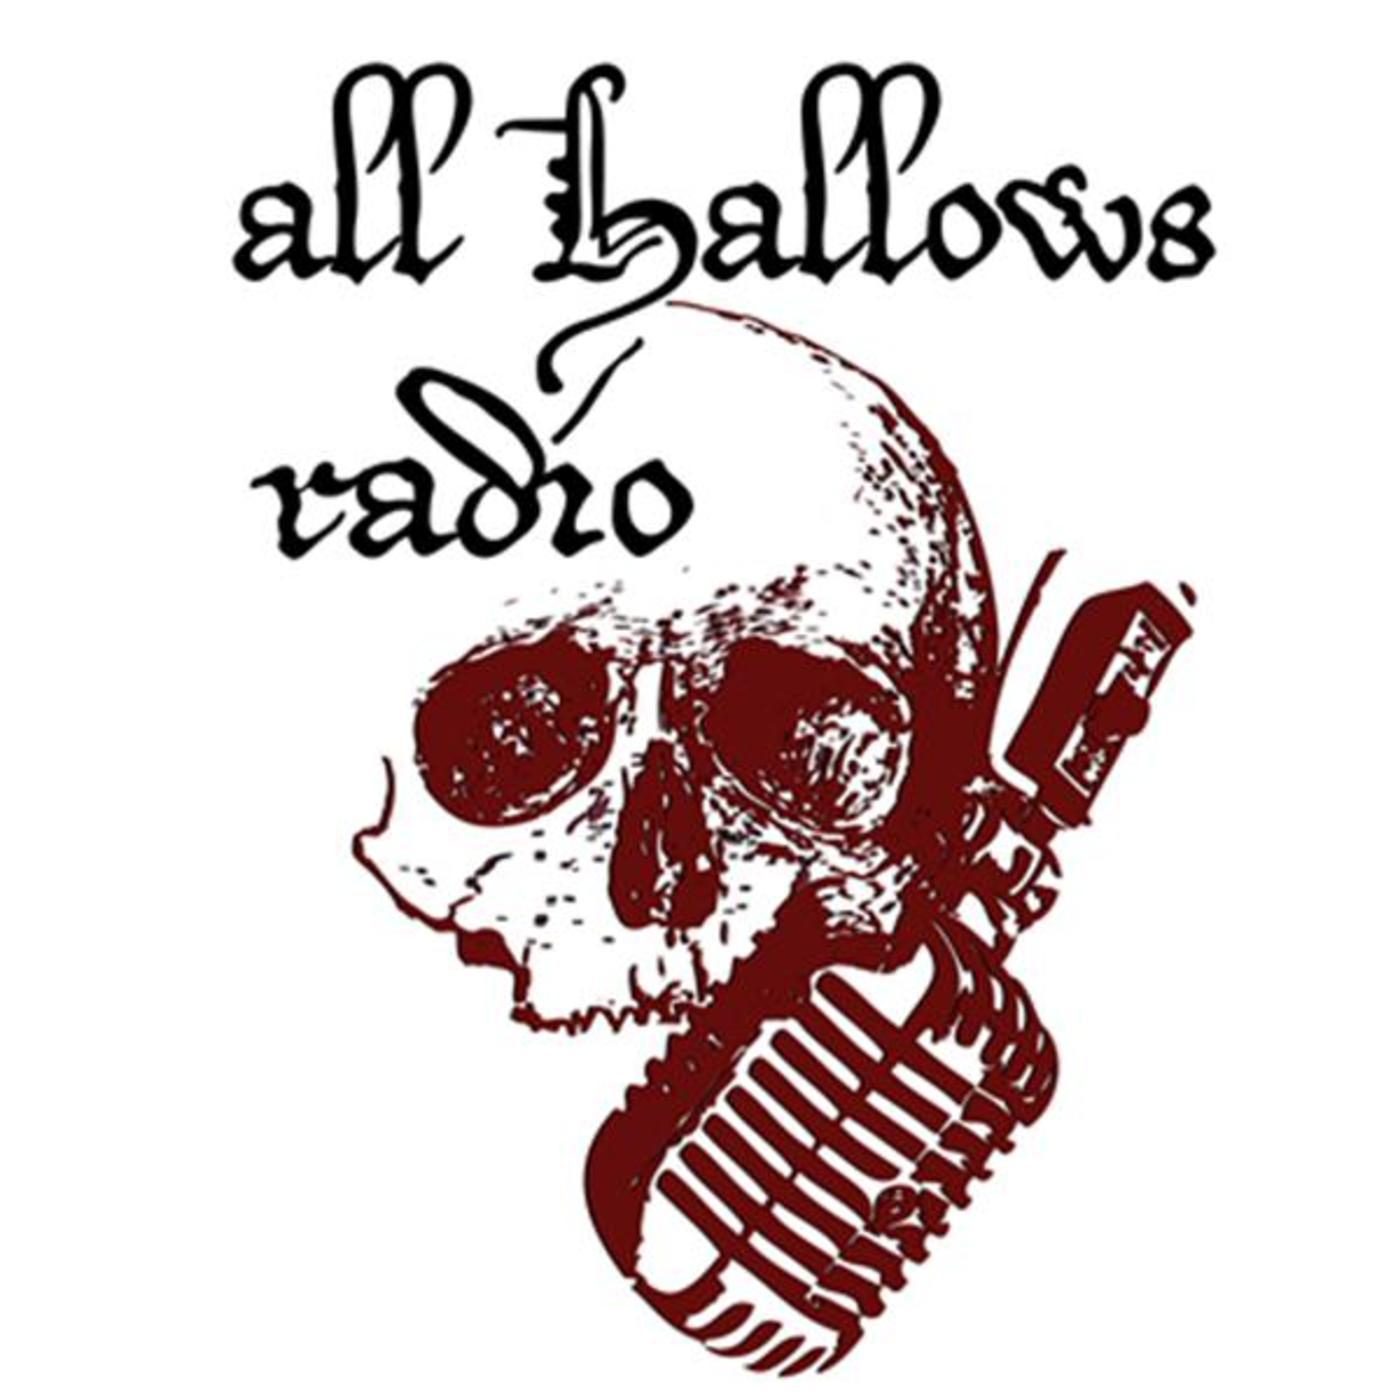 All Hallows Radio